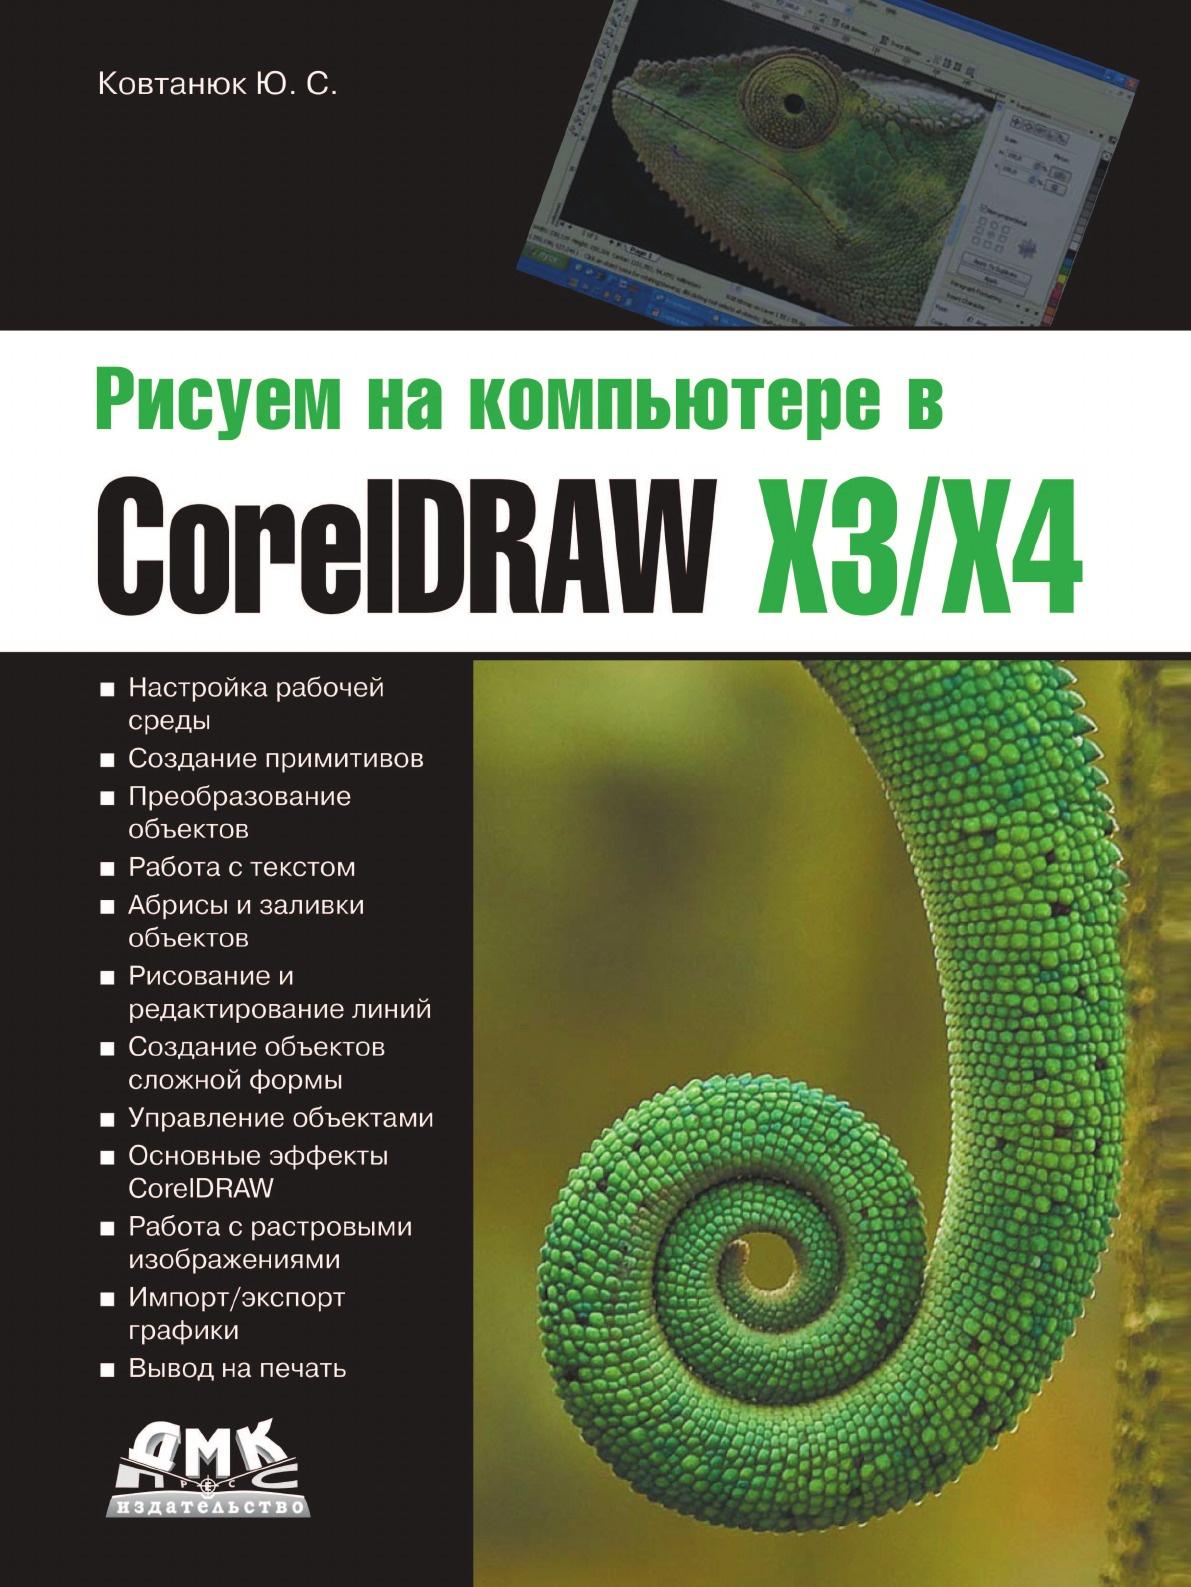 Ю.С. Ковтанюк Рисуем на компьютере в CorelDraw X3/X4